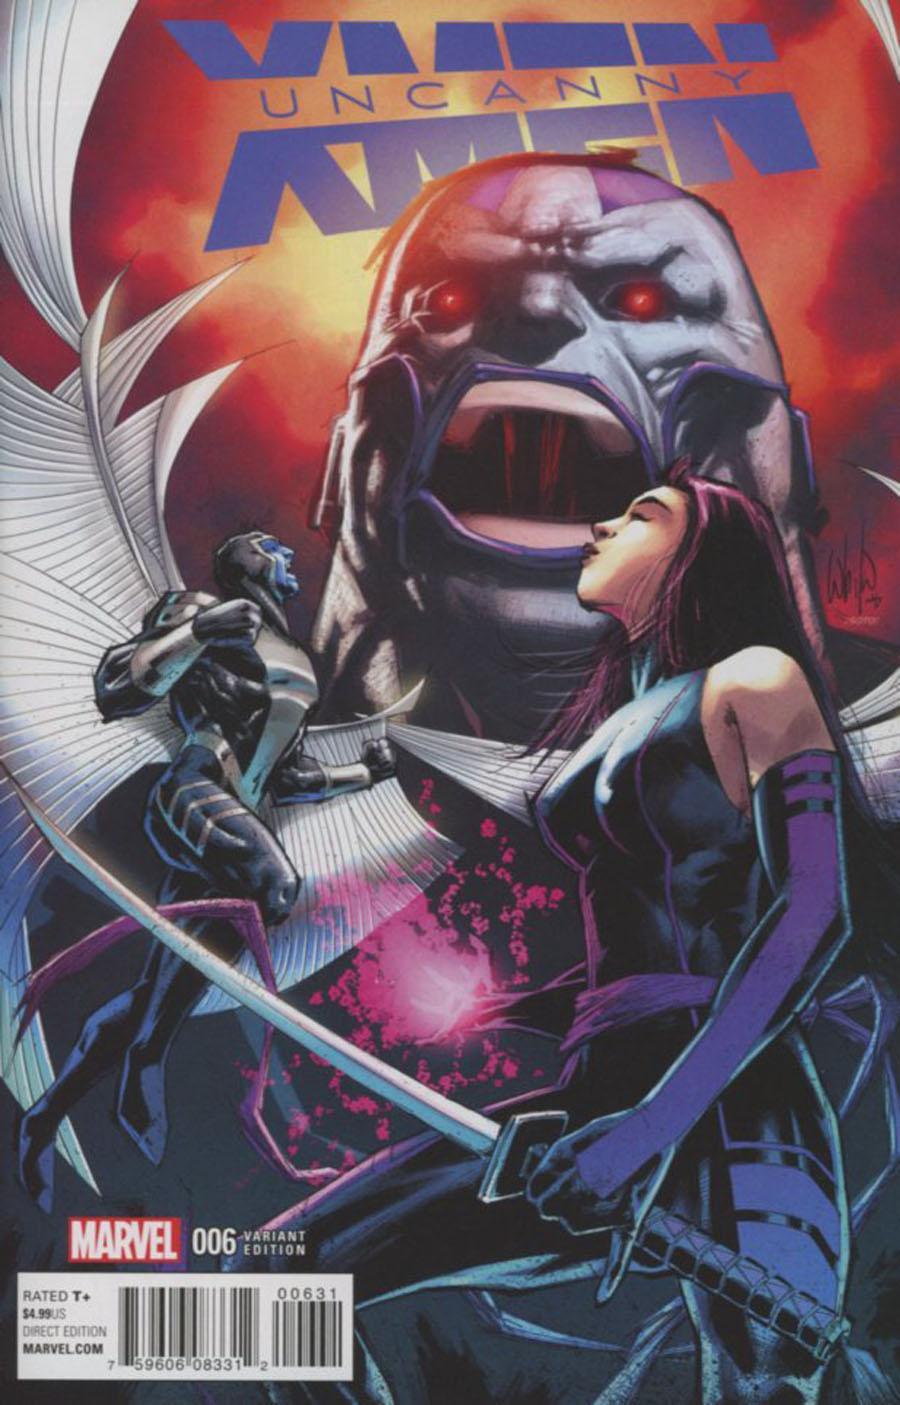 Uncanny X-Men Vol 4 #6 Cover D Incentive Classic Variant Cover (X-Men Apocalypse Wars Tie-In)